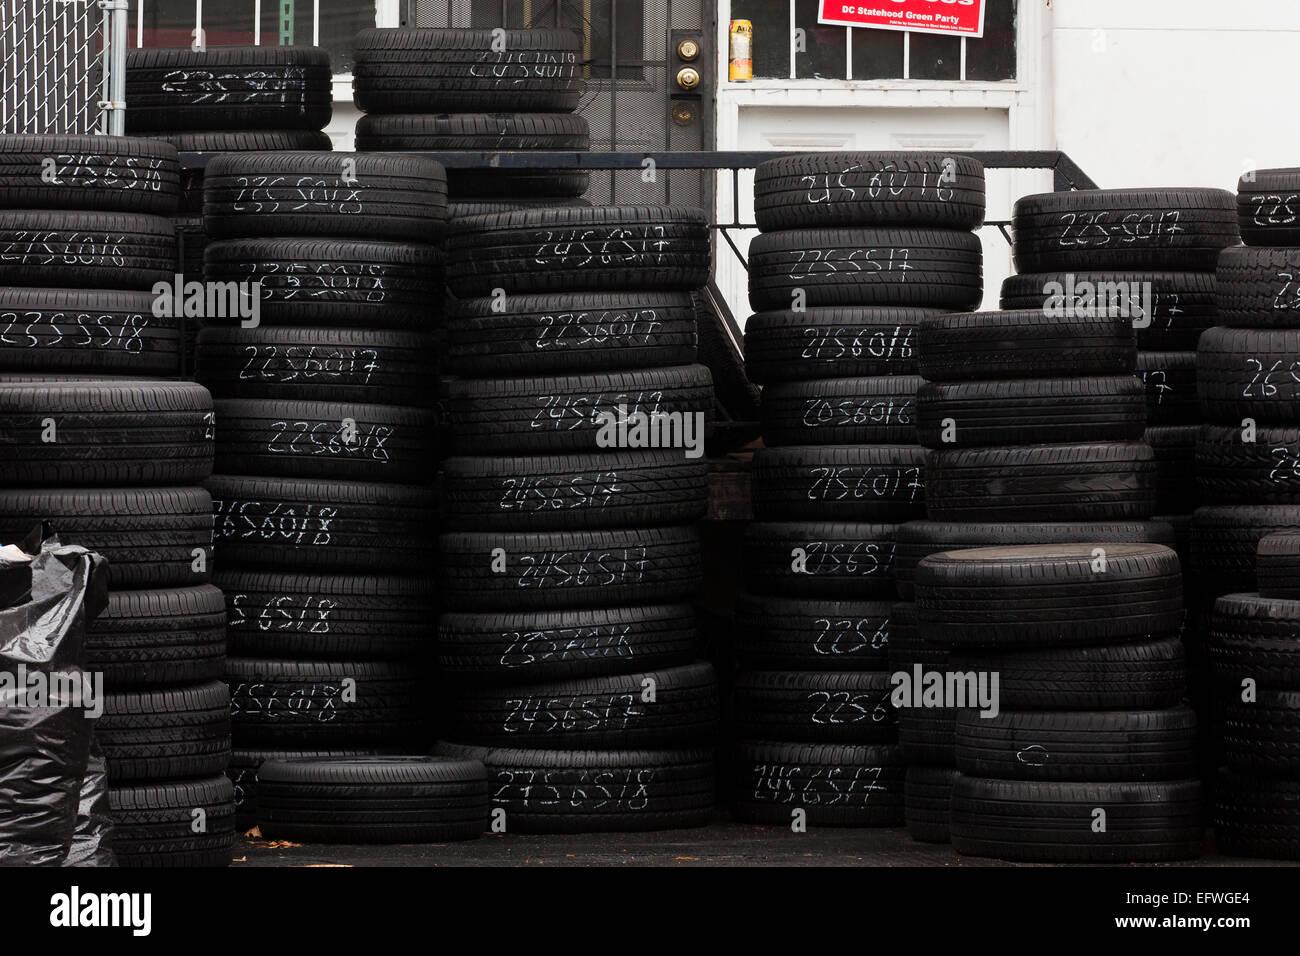 Pneumatici impilati al negozio di pneumatici - USA Immagini Stock